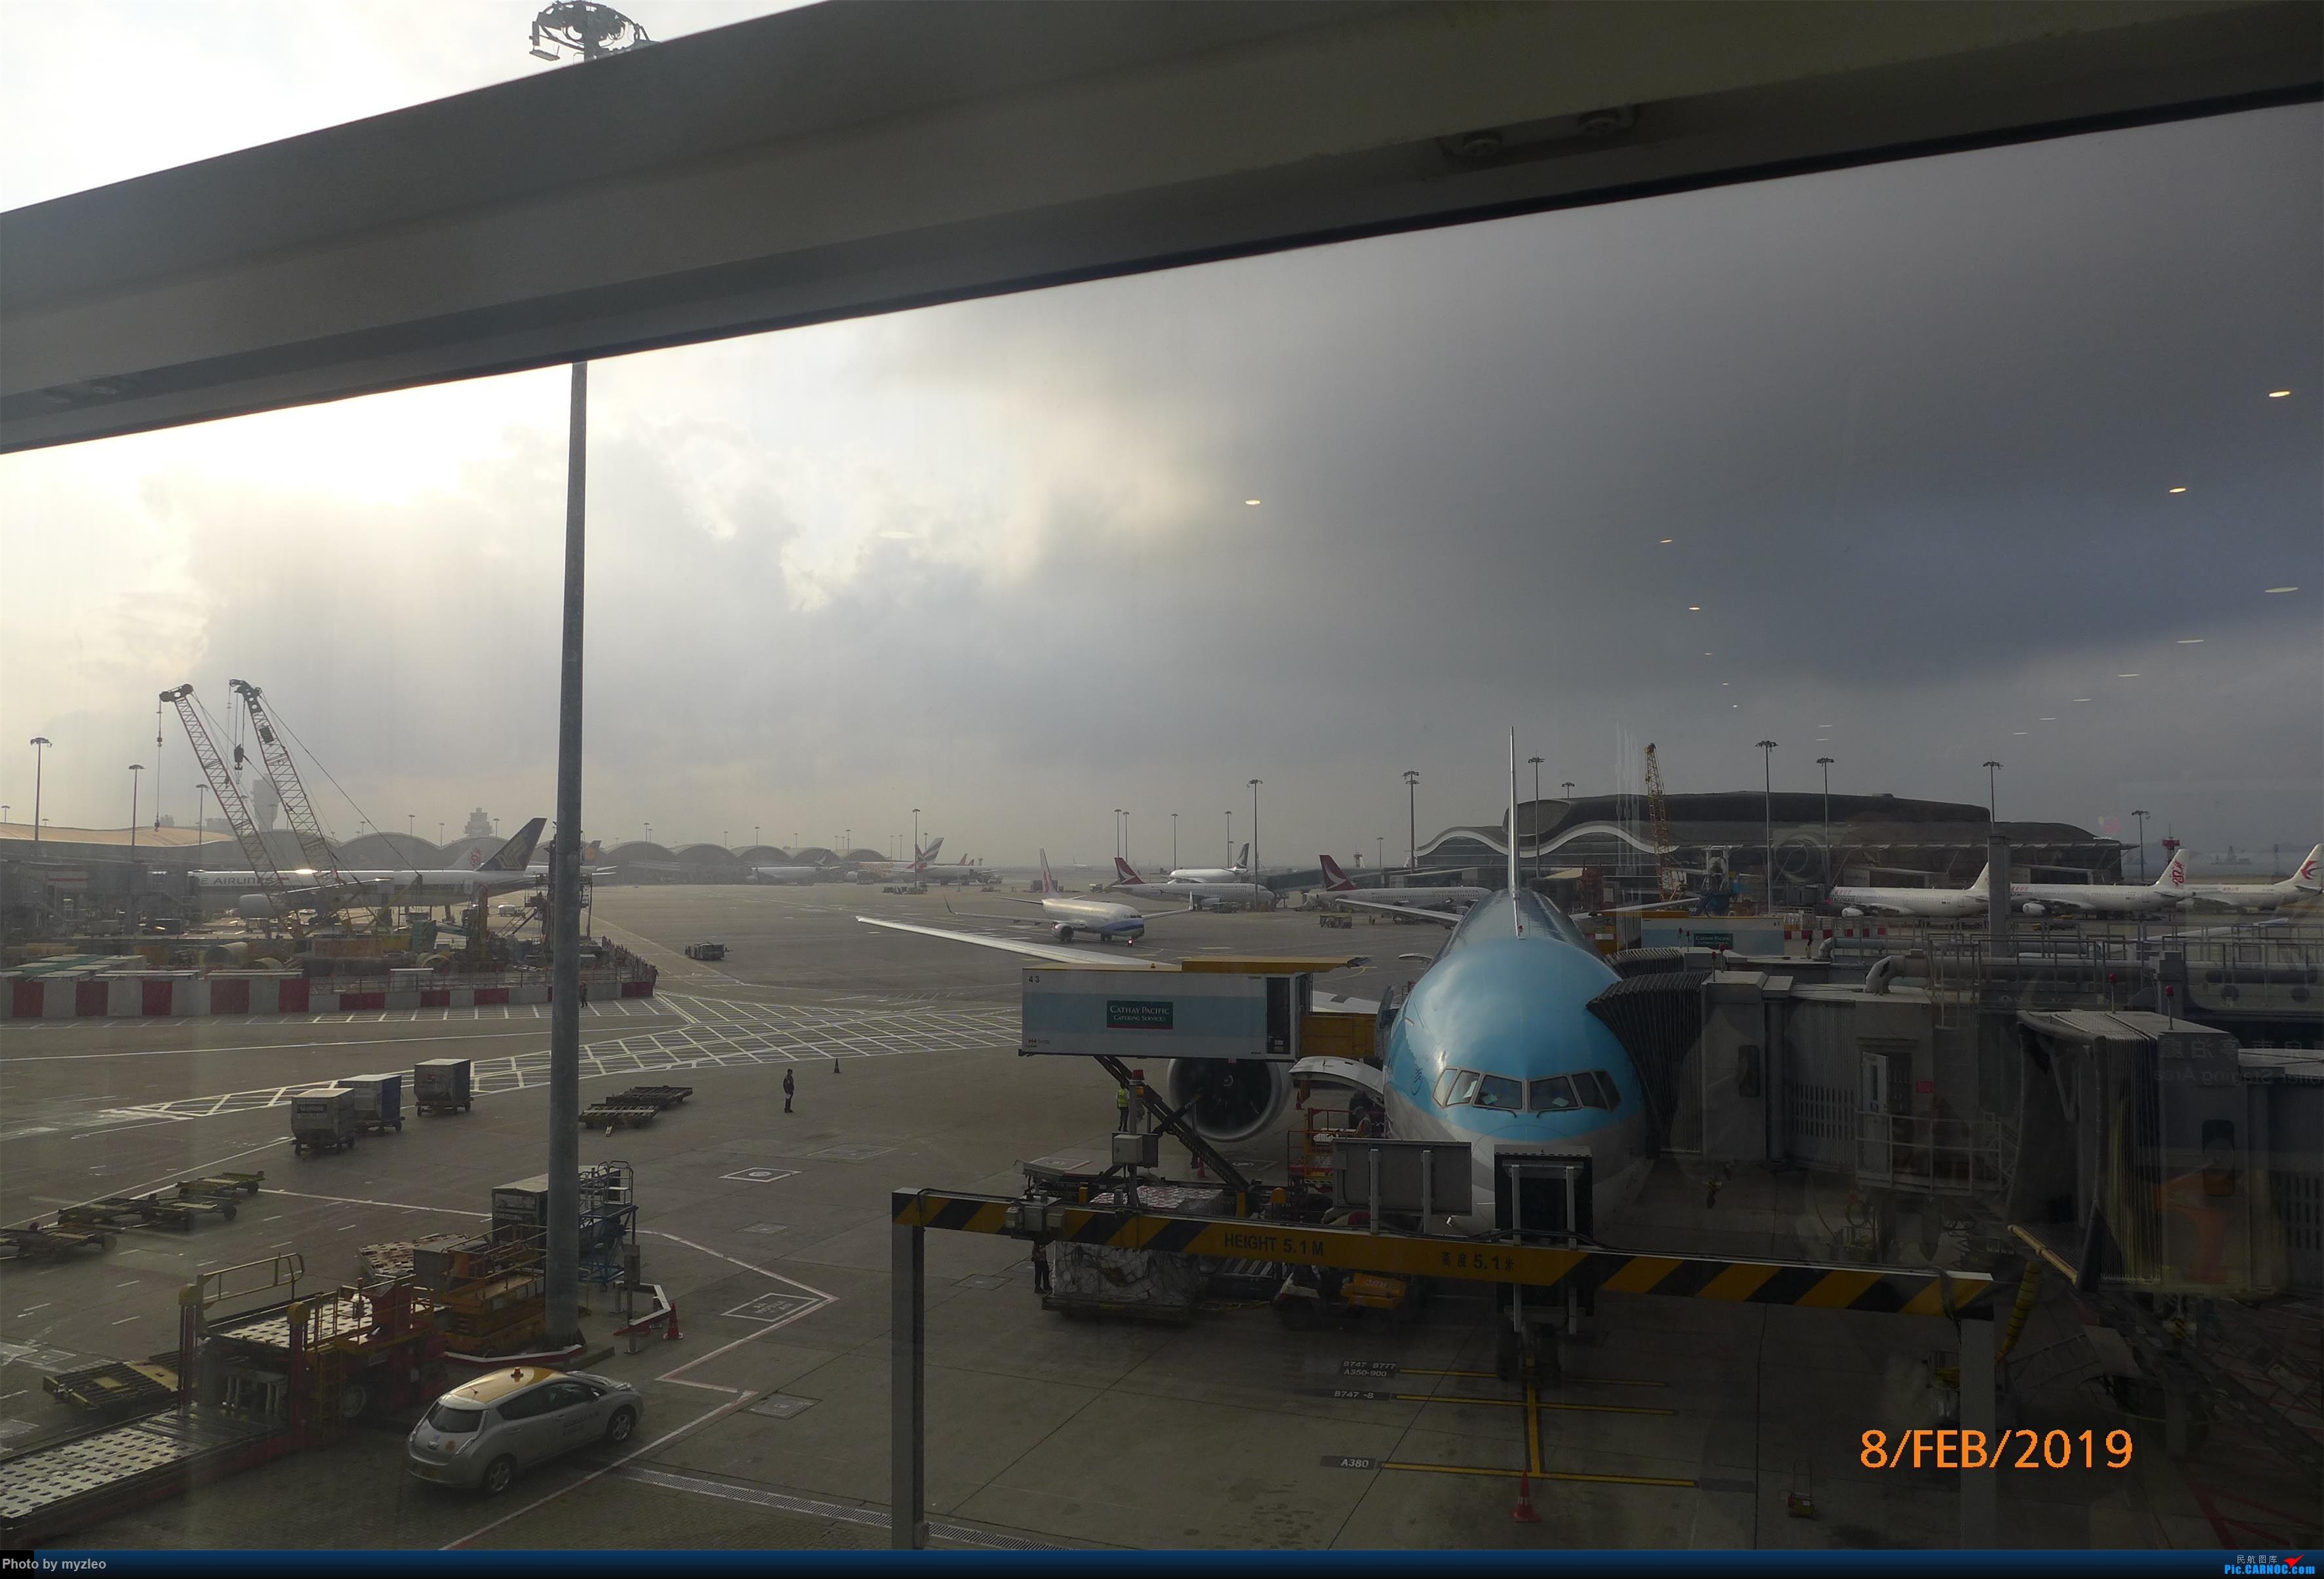 Re:【myzleo的游记4.5】十年之约(5)在香港的最后一天,搭乘港航333回沪    中国香港国际机场